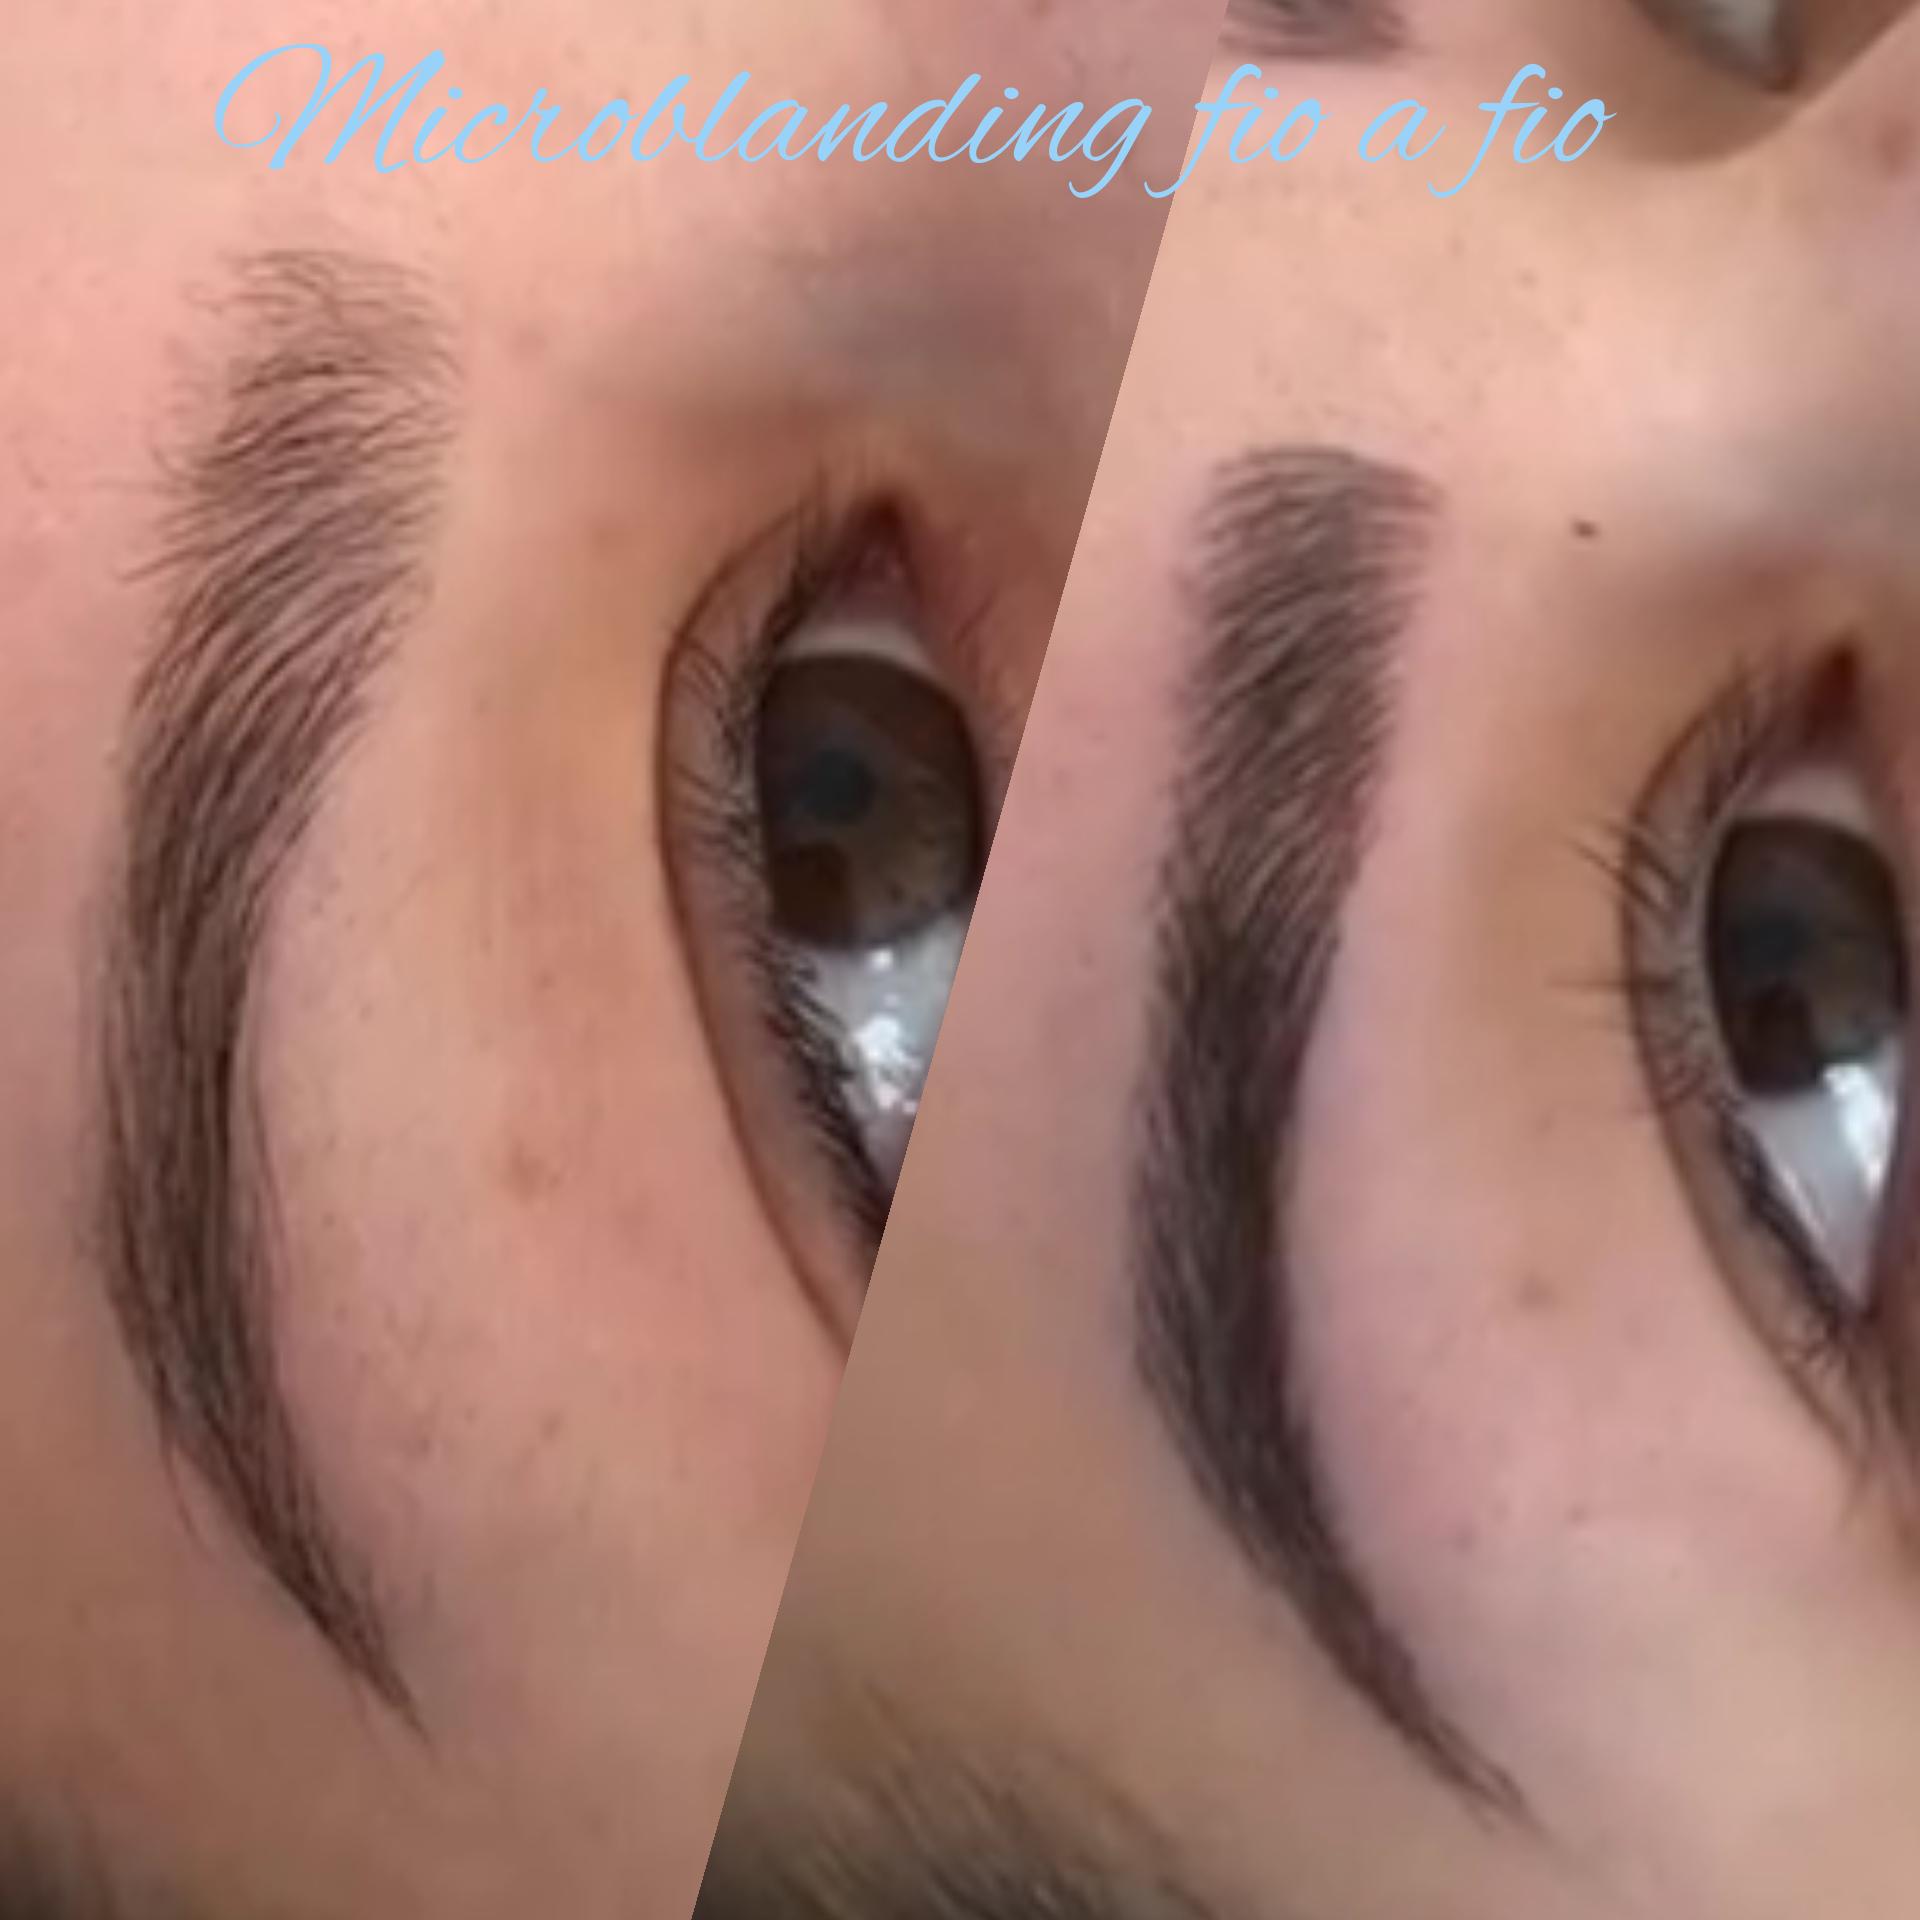 Preenchimento fio a fio microblanding  estética cabeleireiro(a) designer de sobrancelhas micropigmentador(a)